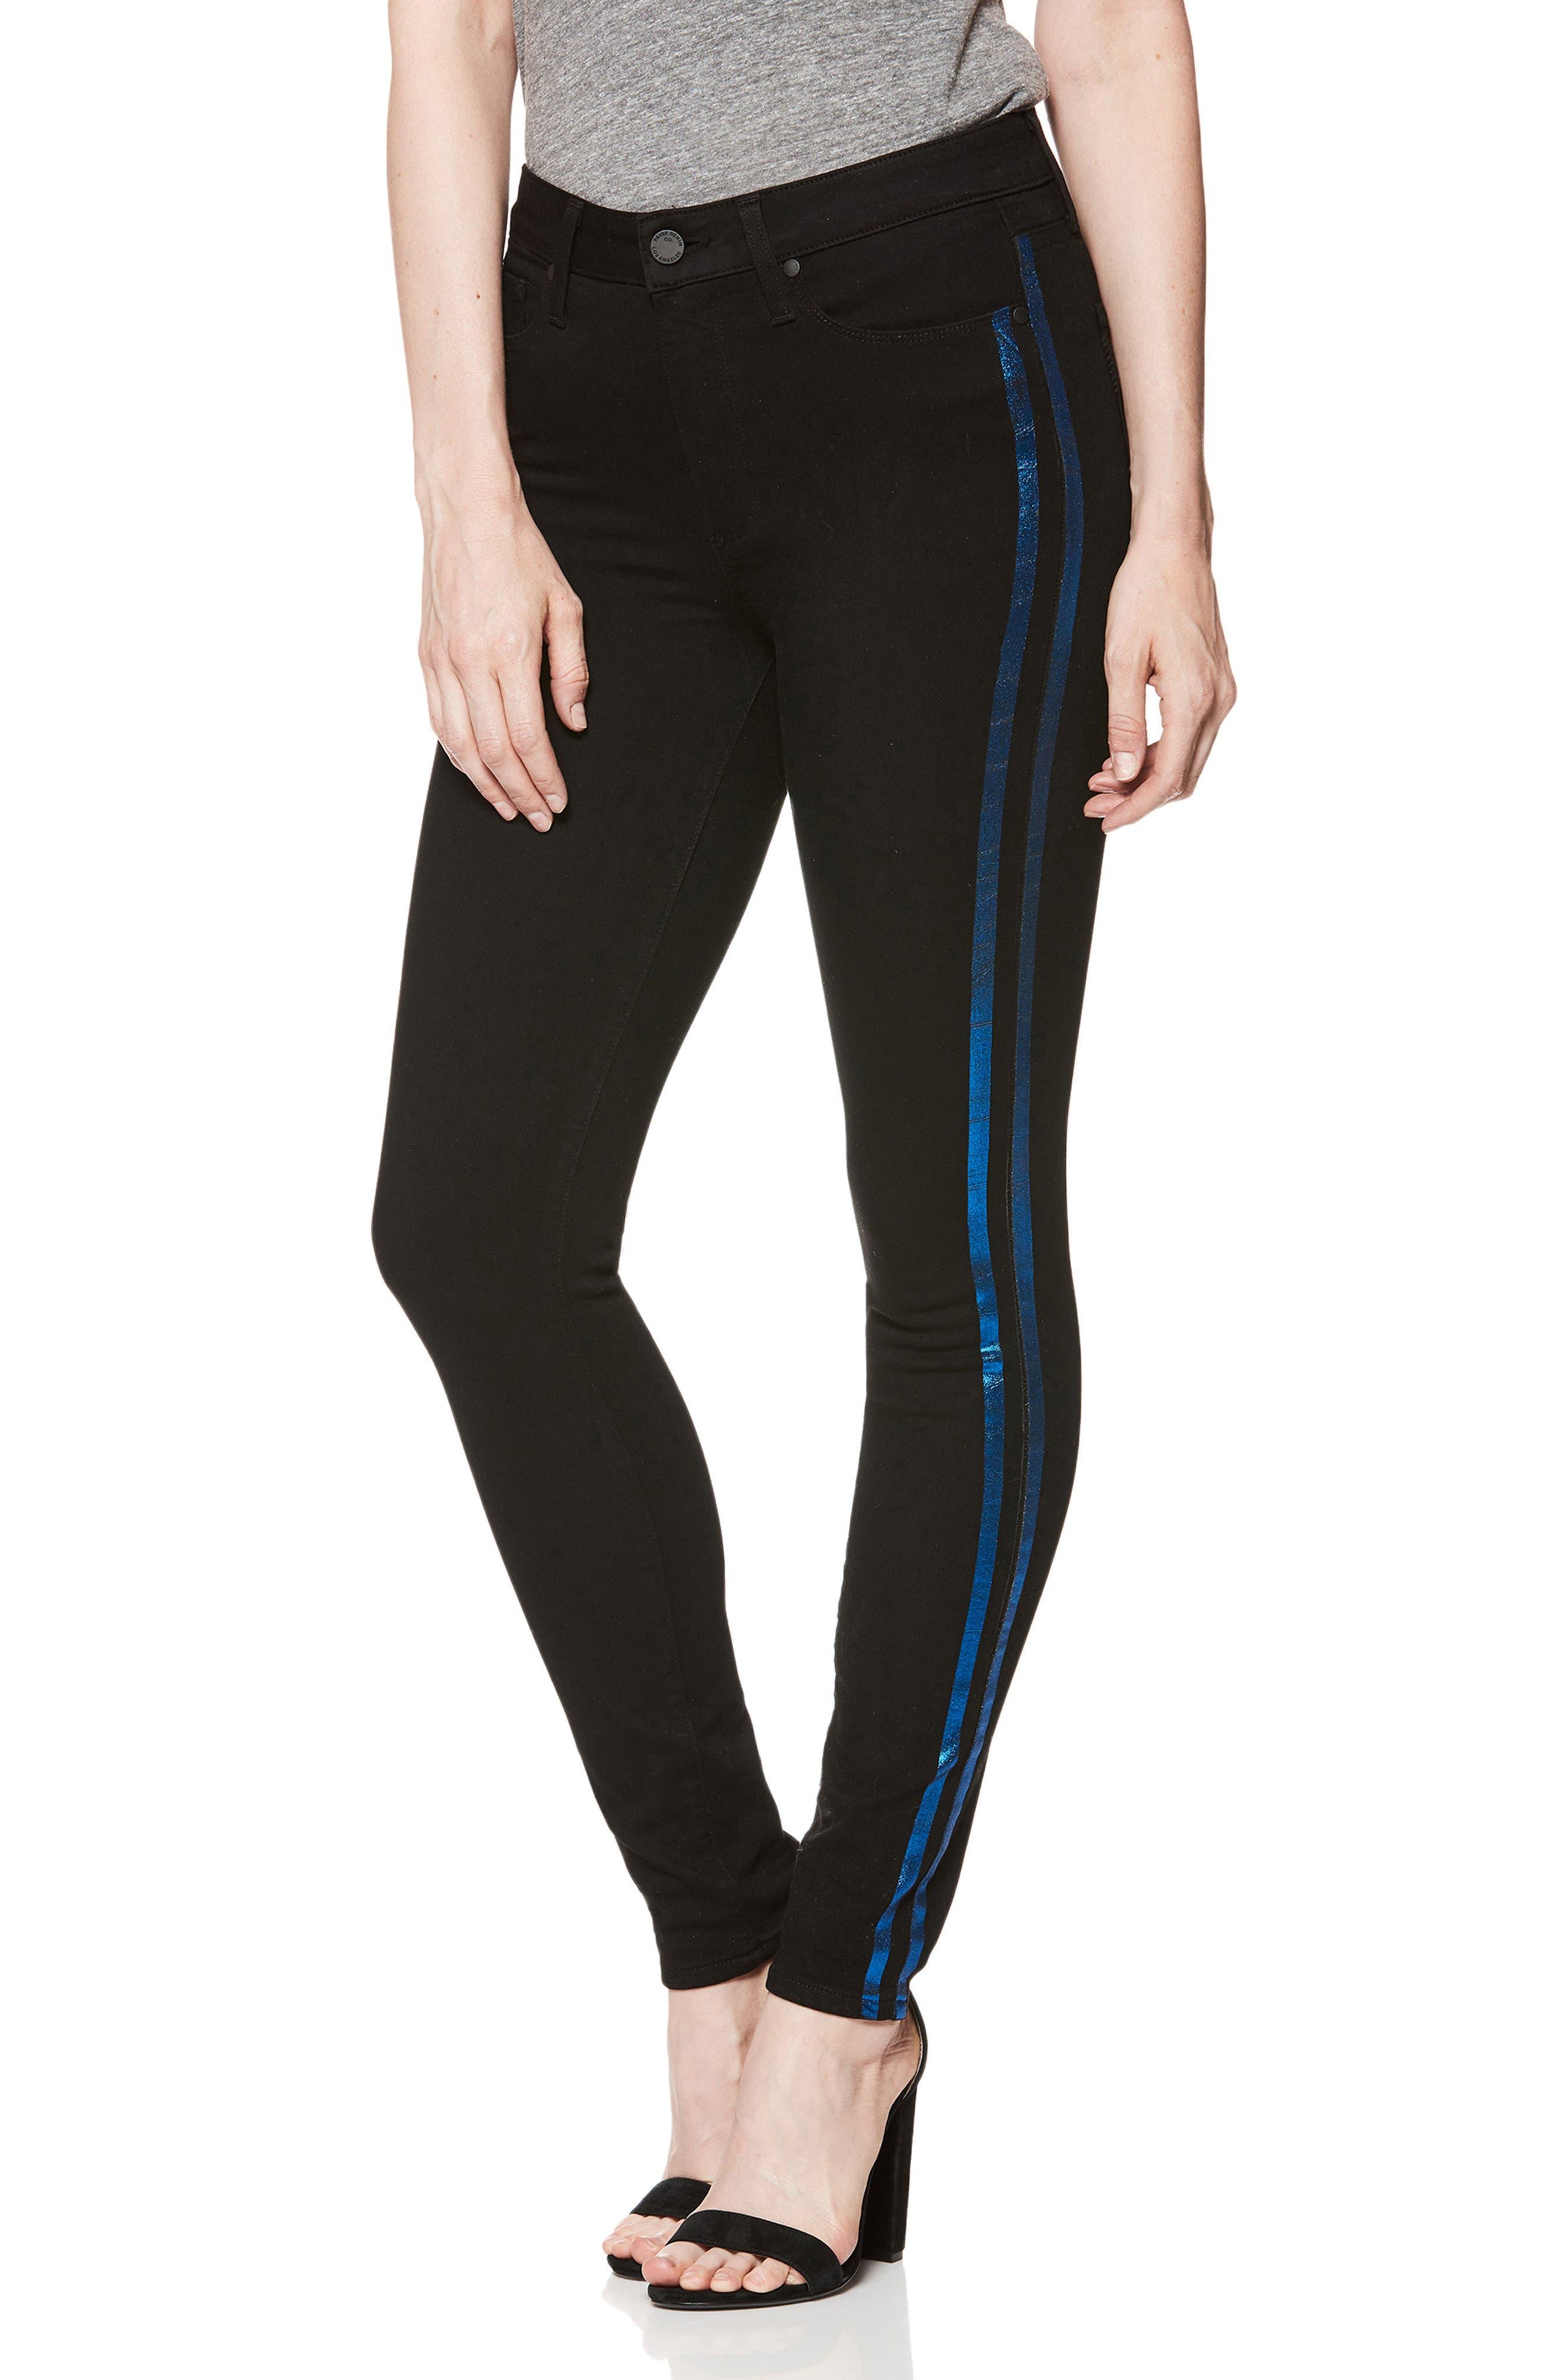 Transcend - Hoxton High Waist Ultra Skinny Jeans,                             Main thumbnail 1, color,                             BLACK SHADOW W/ BLUE